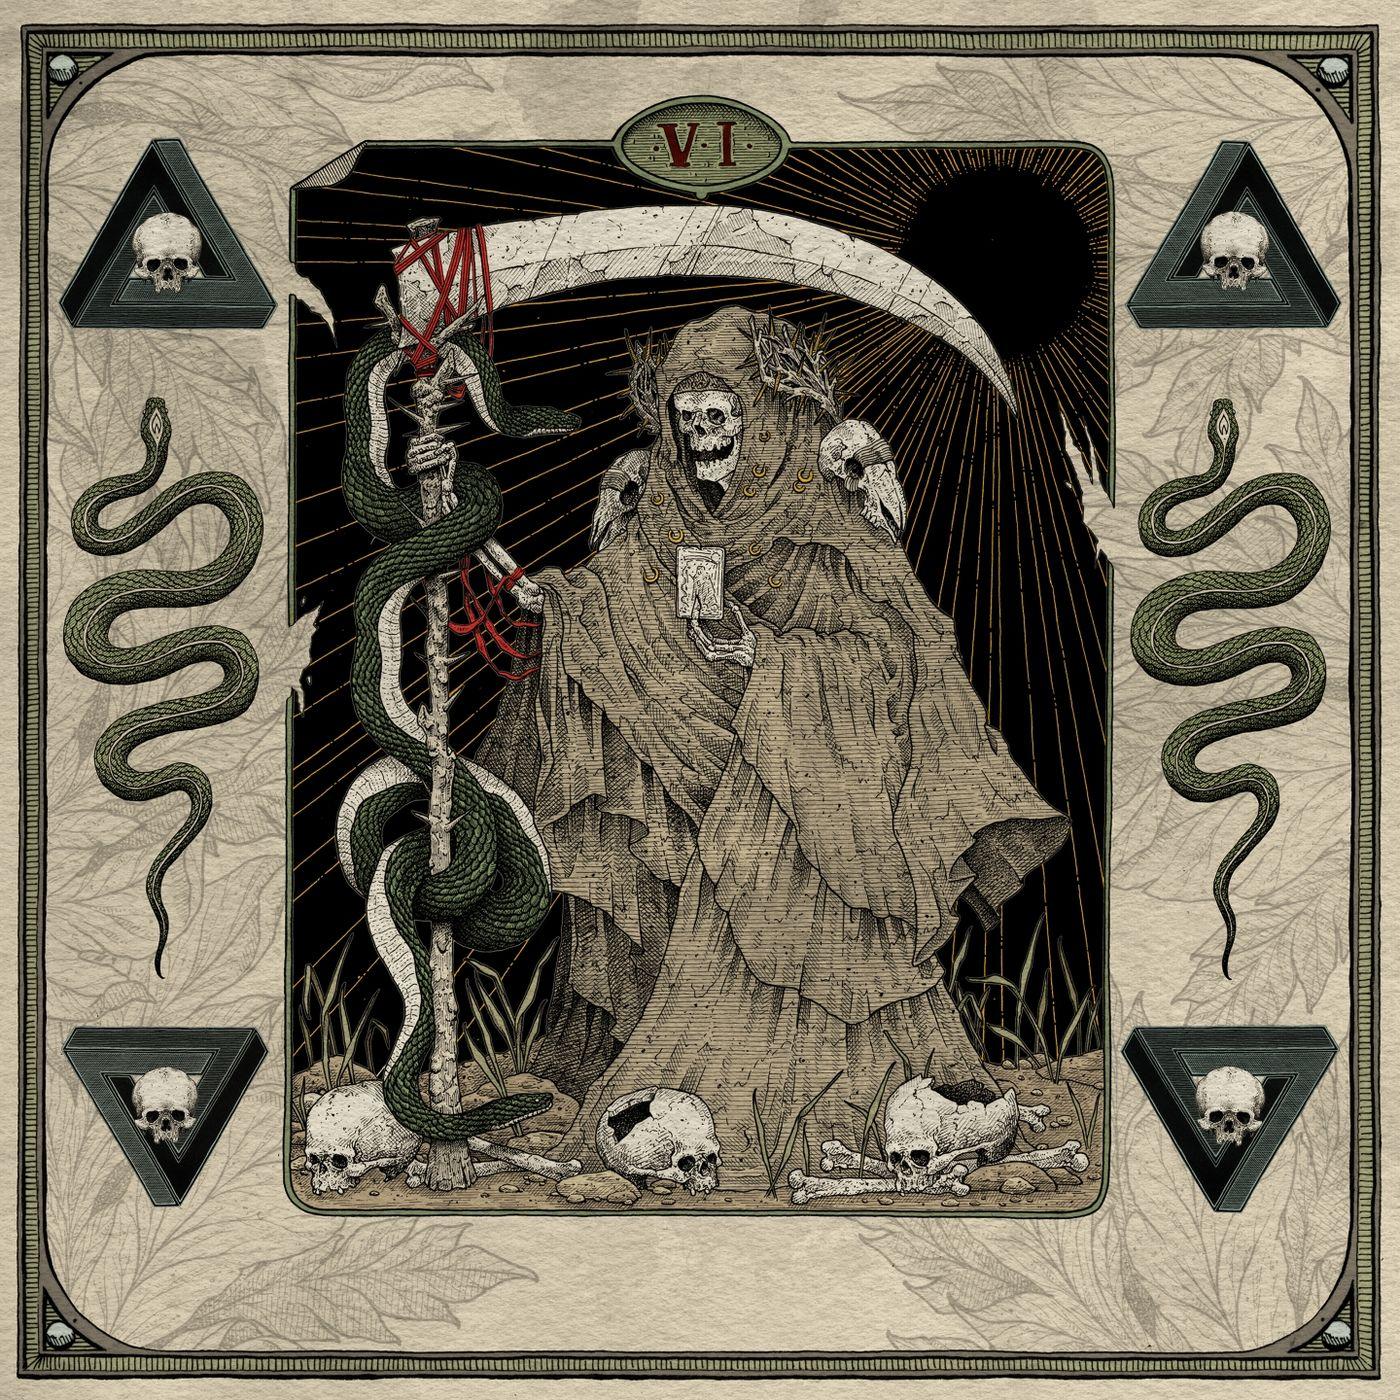 Suicide Silence - Meltdown [single] (2019)